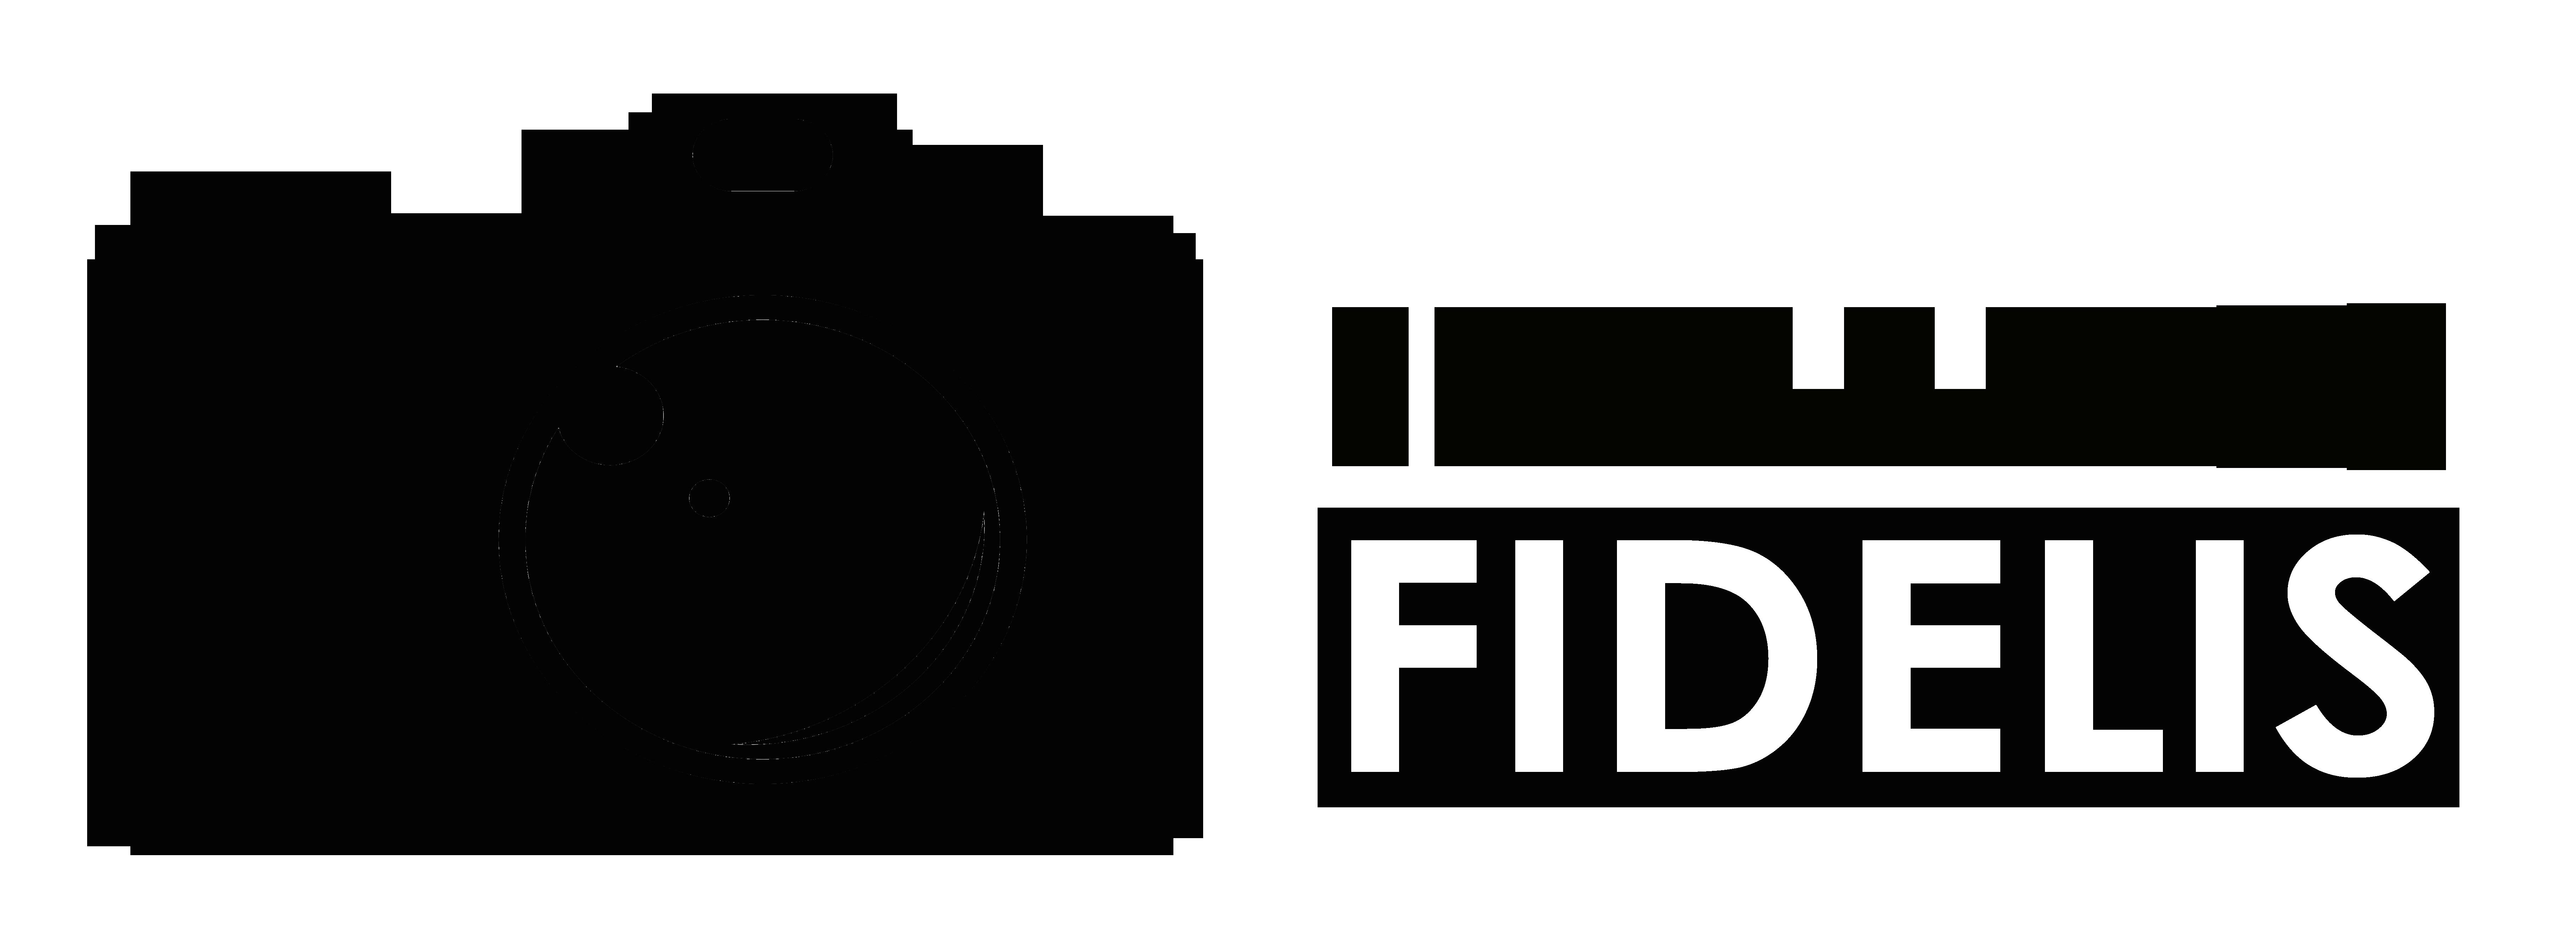 Fernando Fidelis – Eternizando momentos